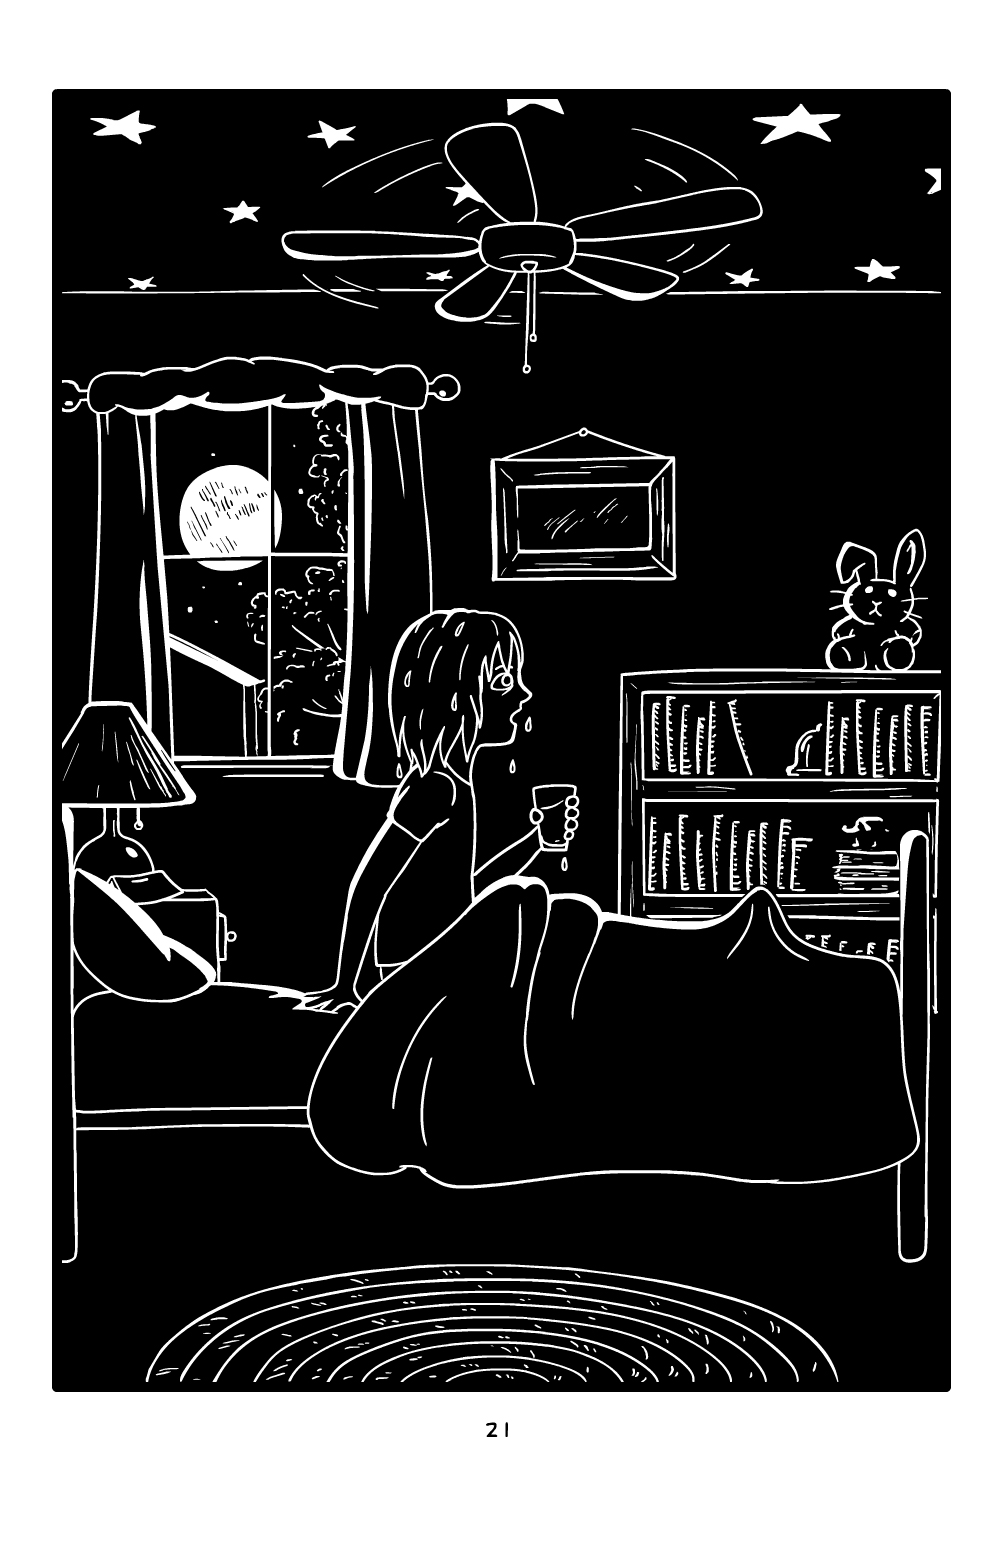 The-Body-Sleeps-9-15-21.jpg